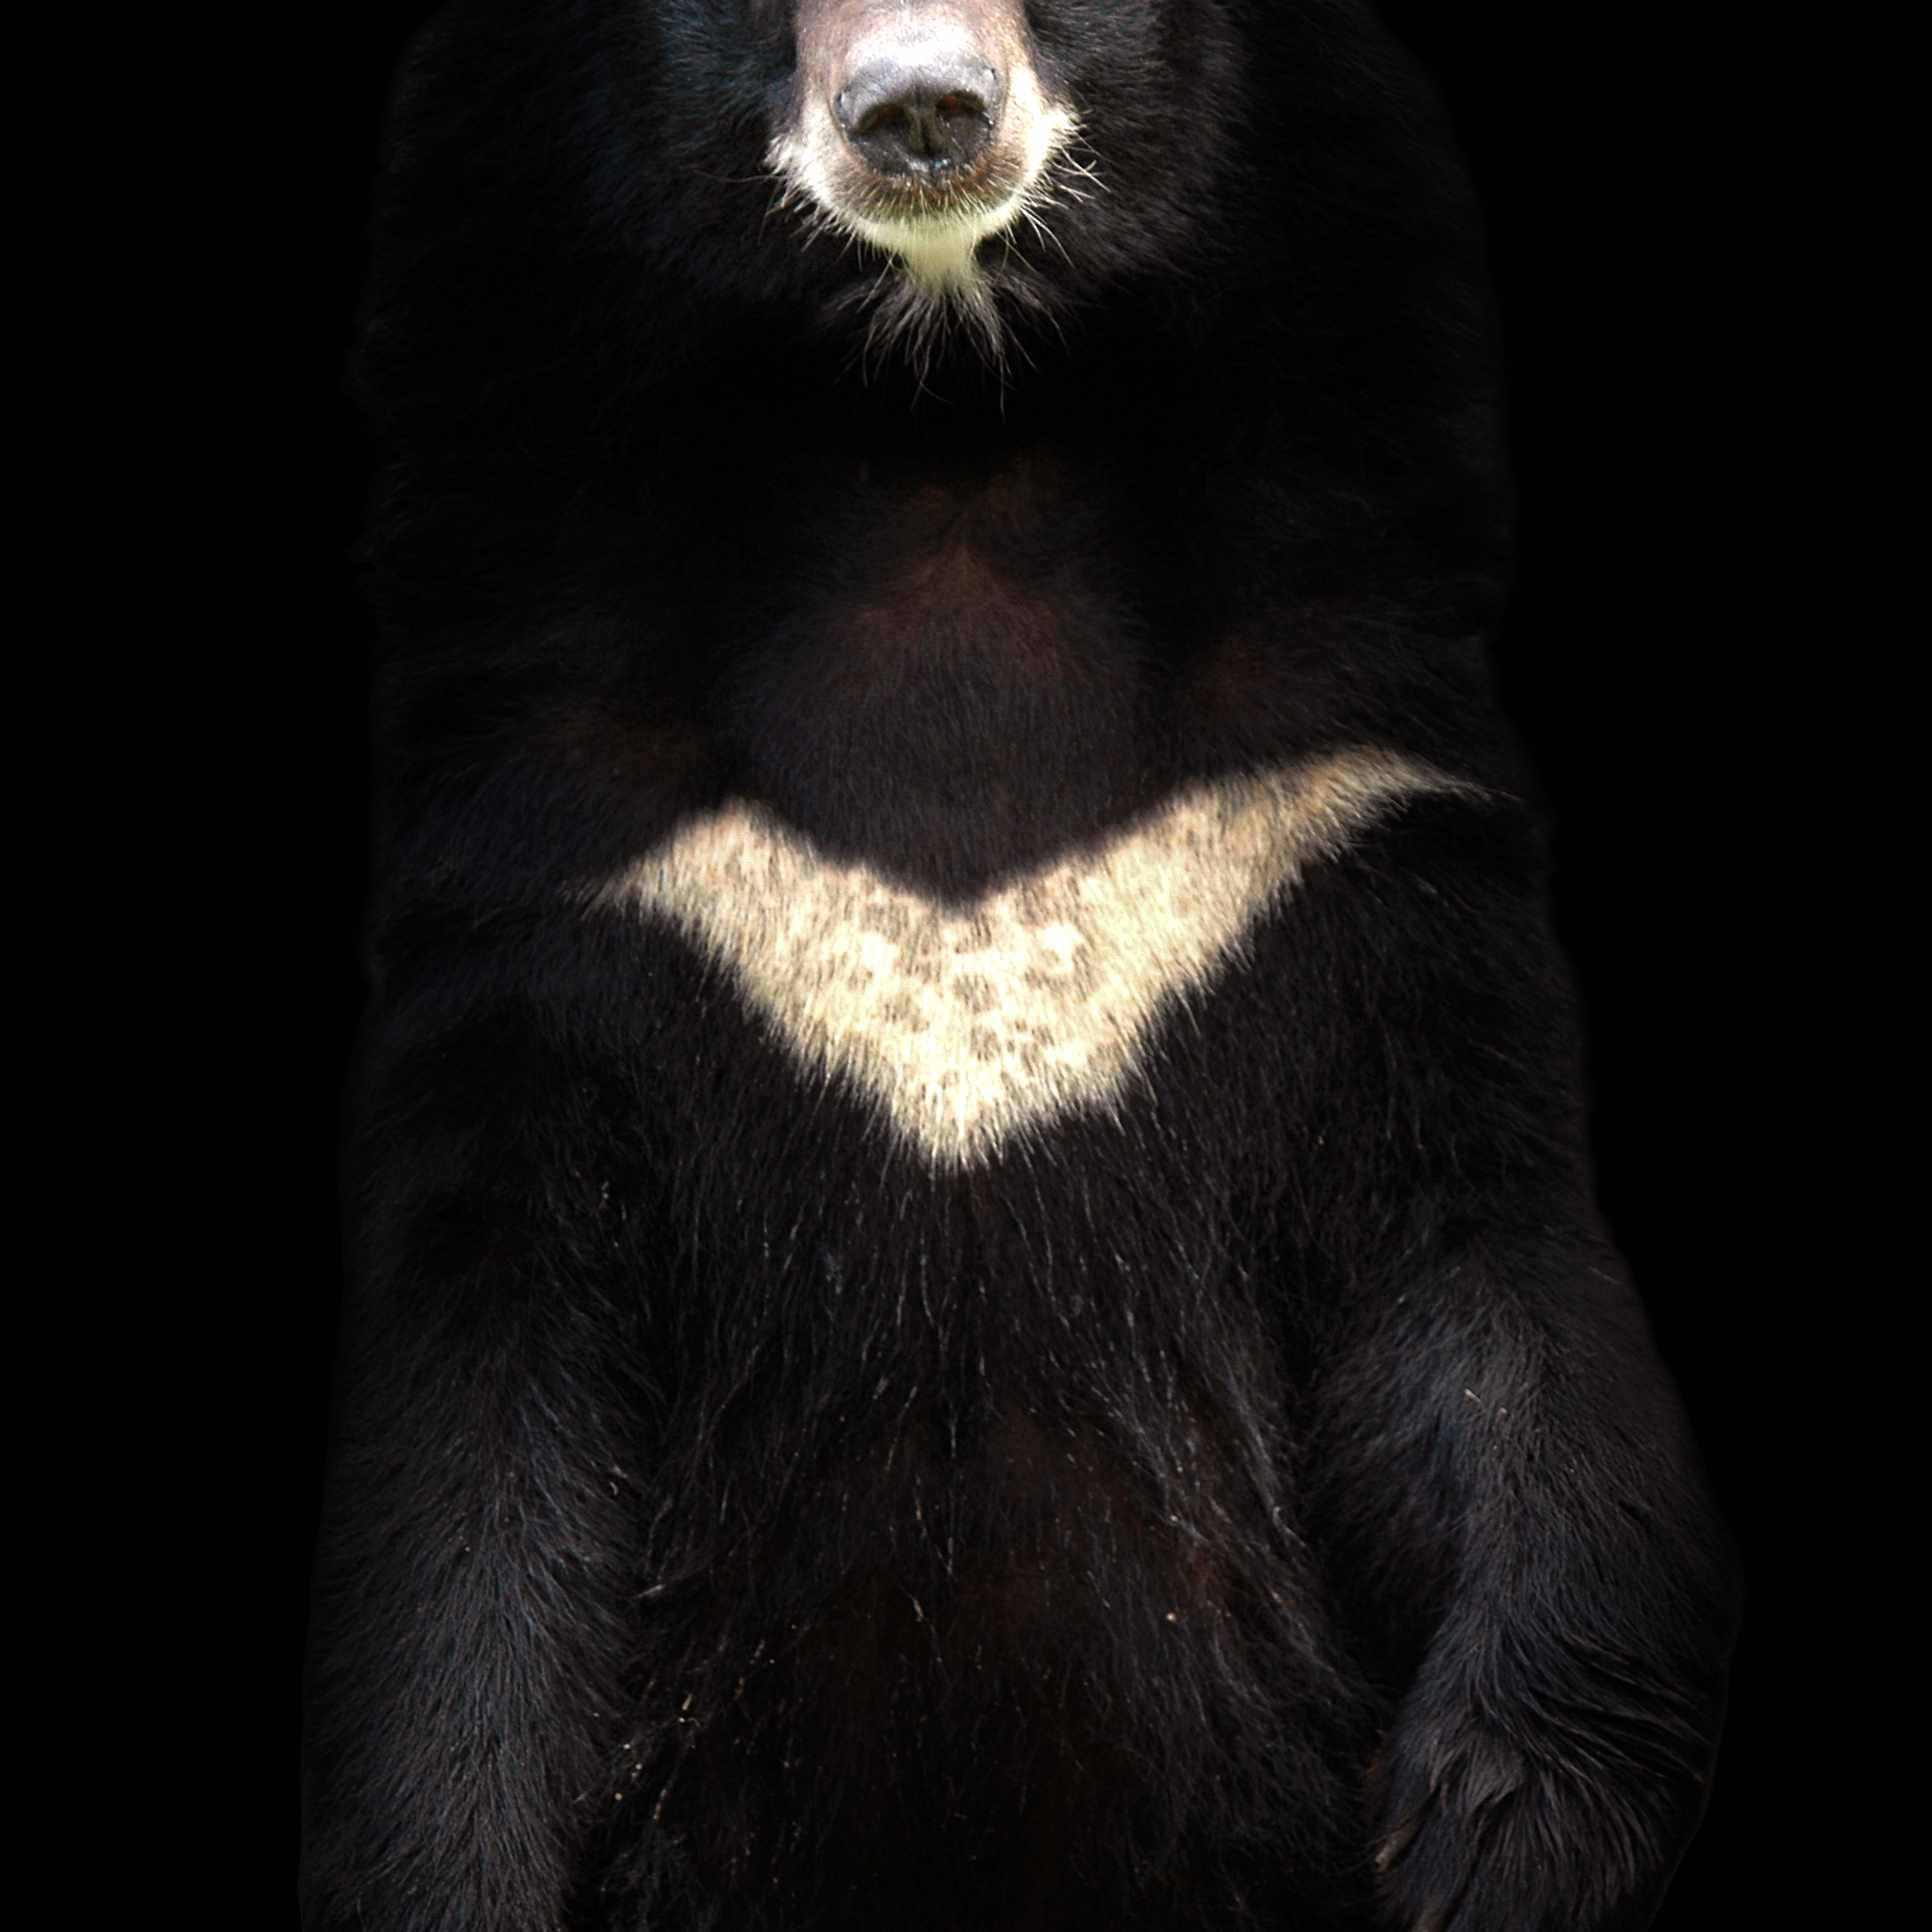 Asiatic black bear, aka moon bear